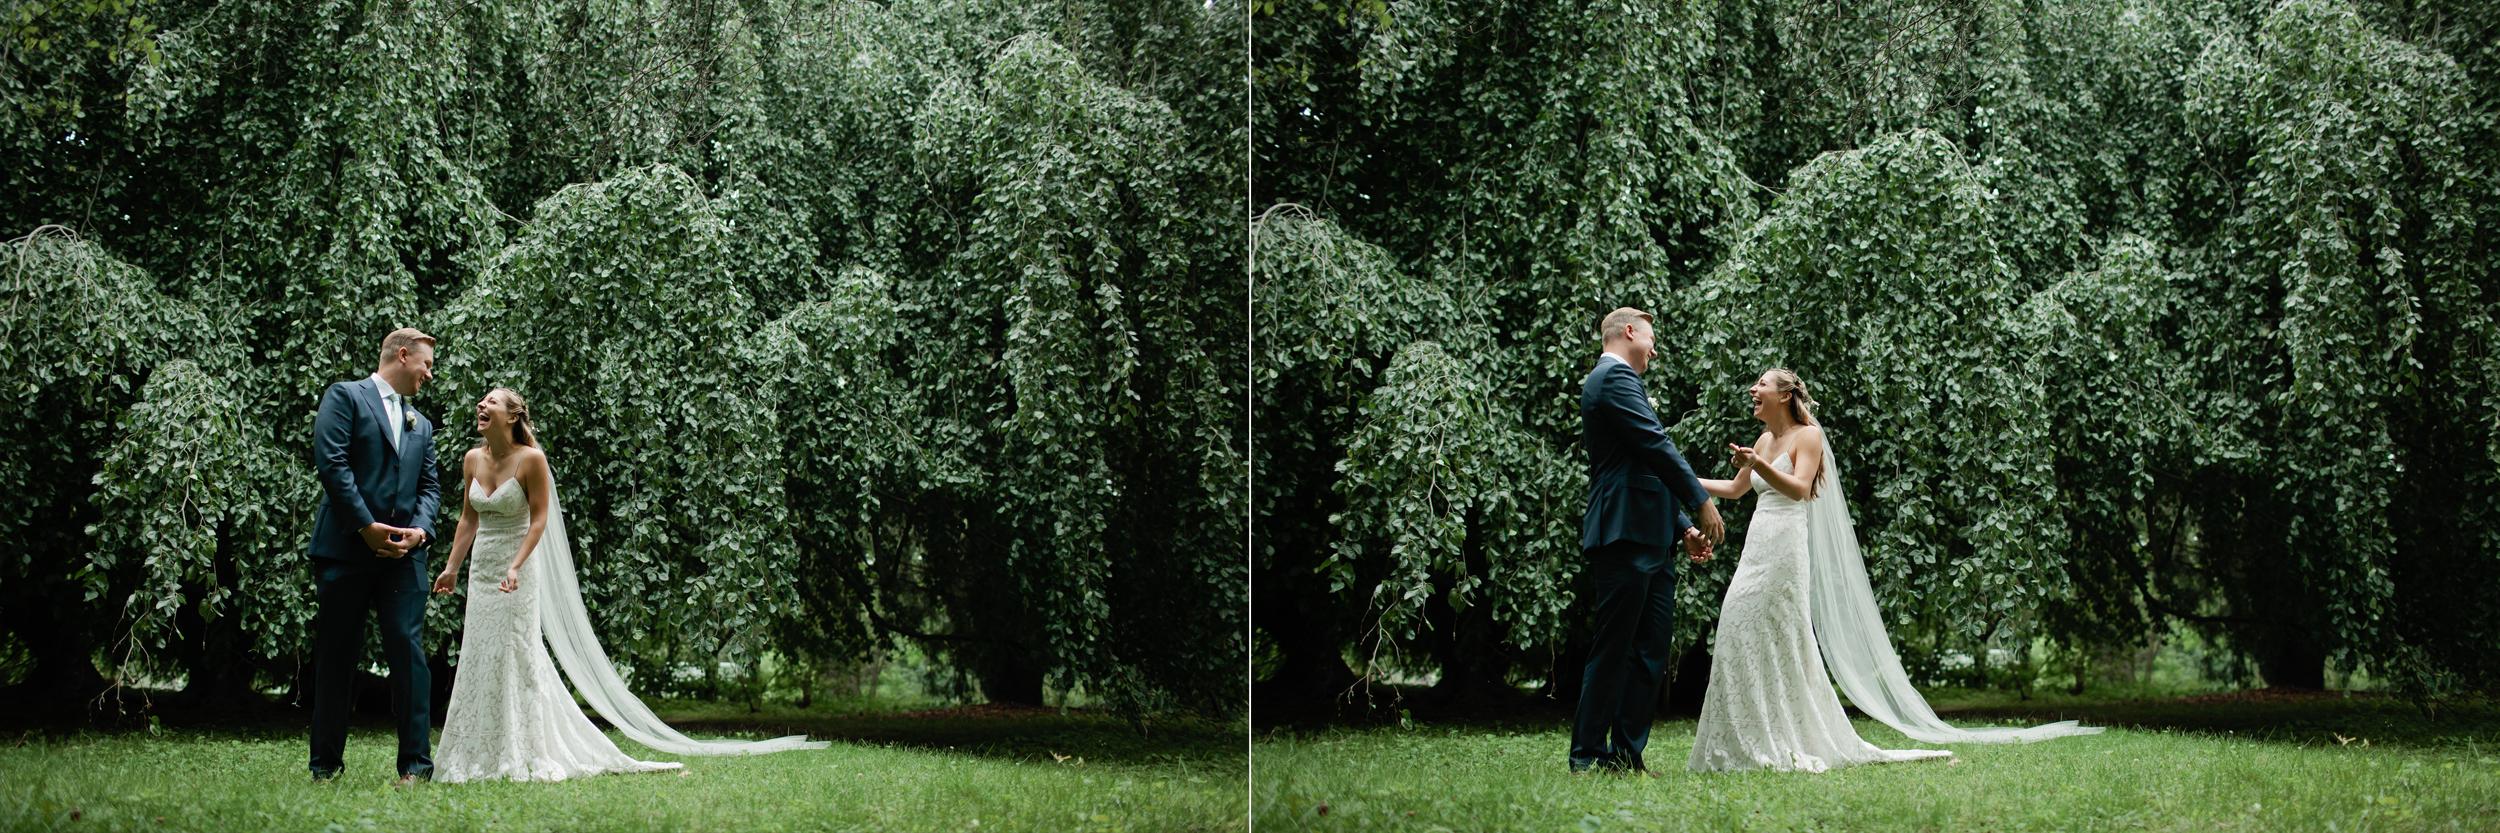 Best-Maine-Wedding-Photographer-1g.jpg